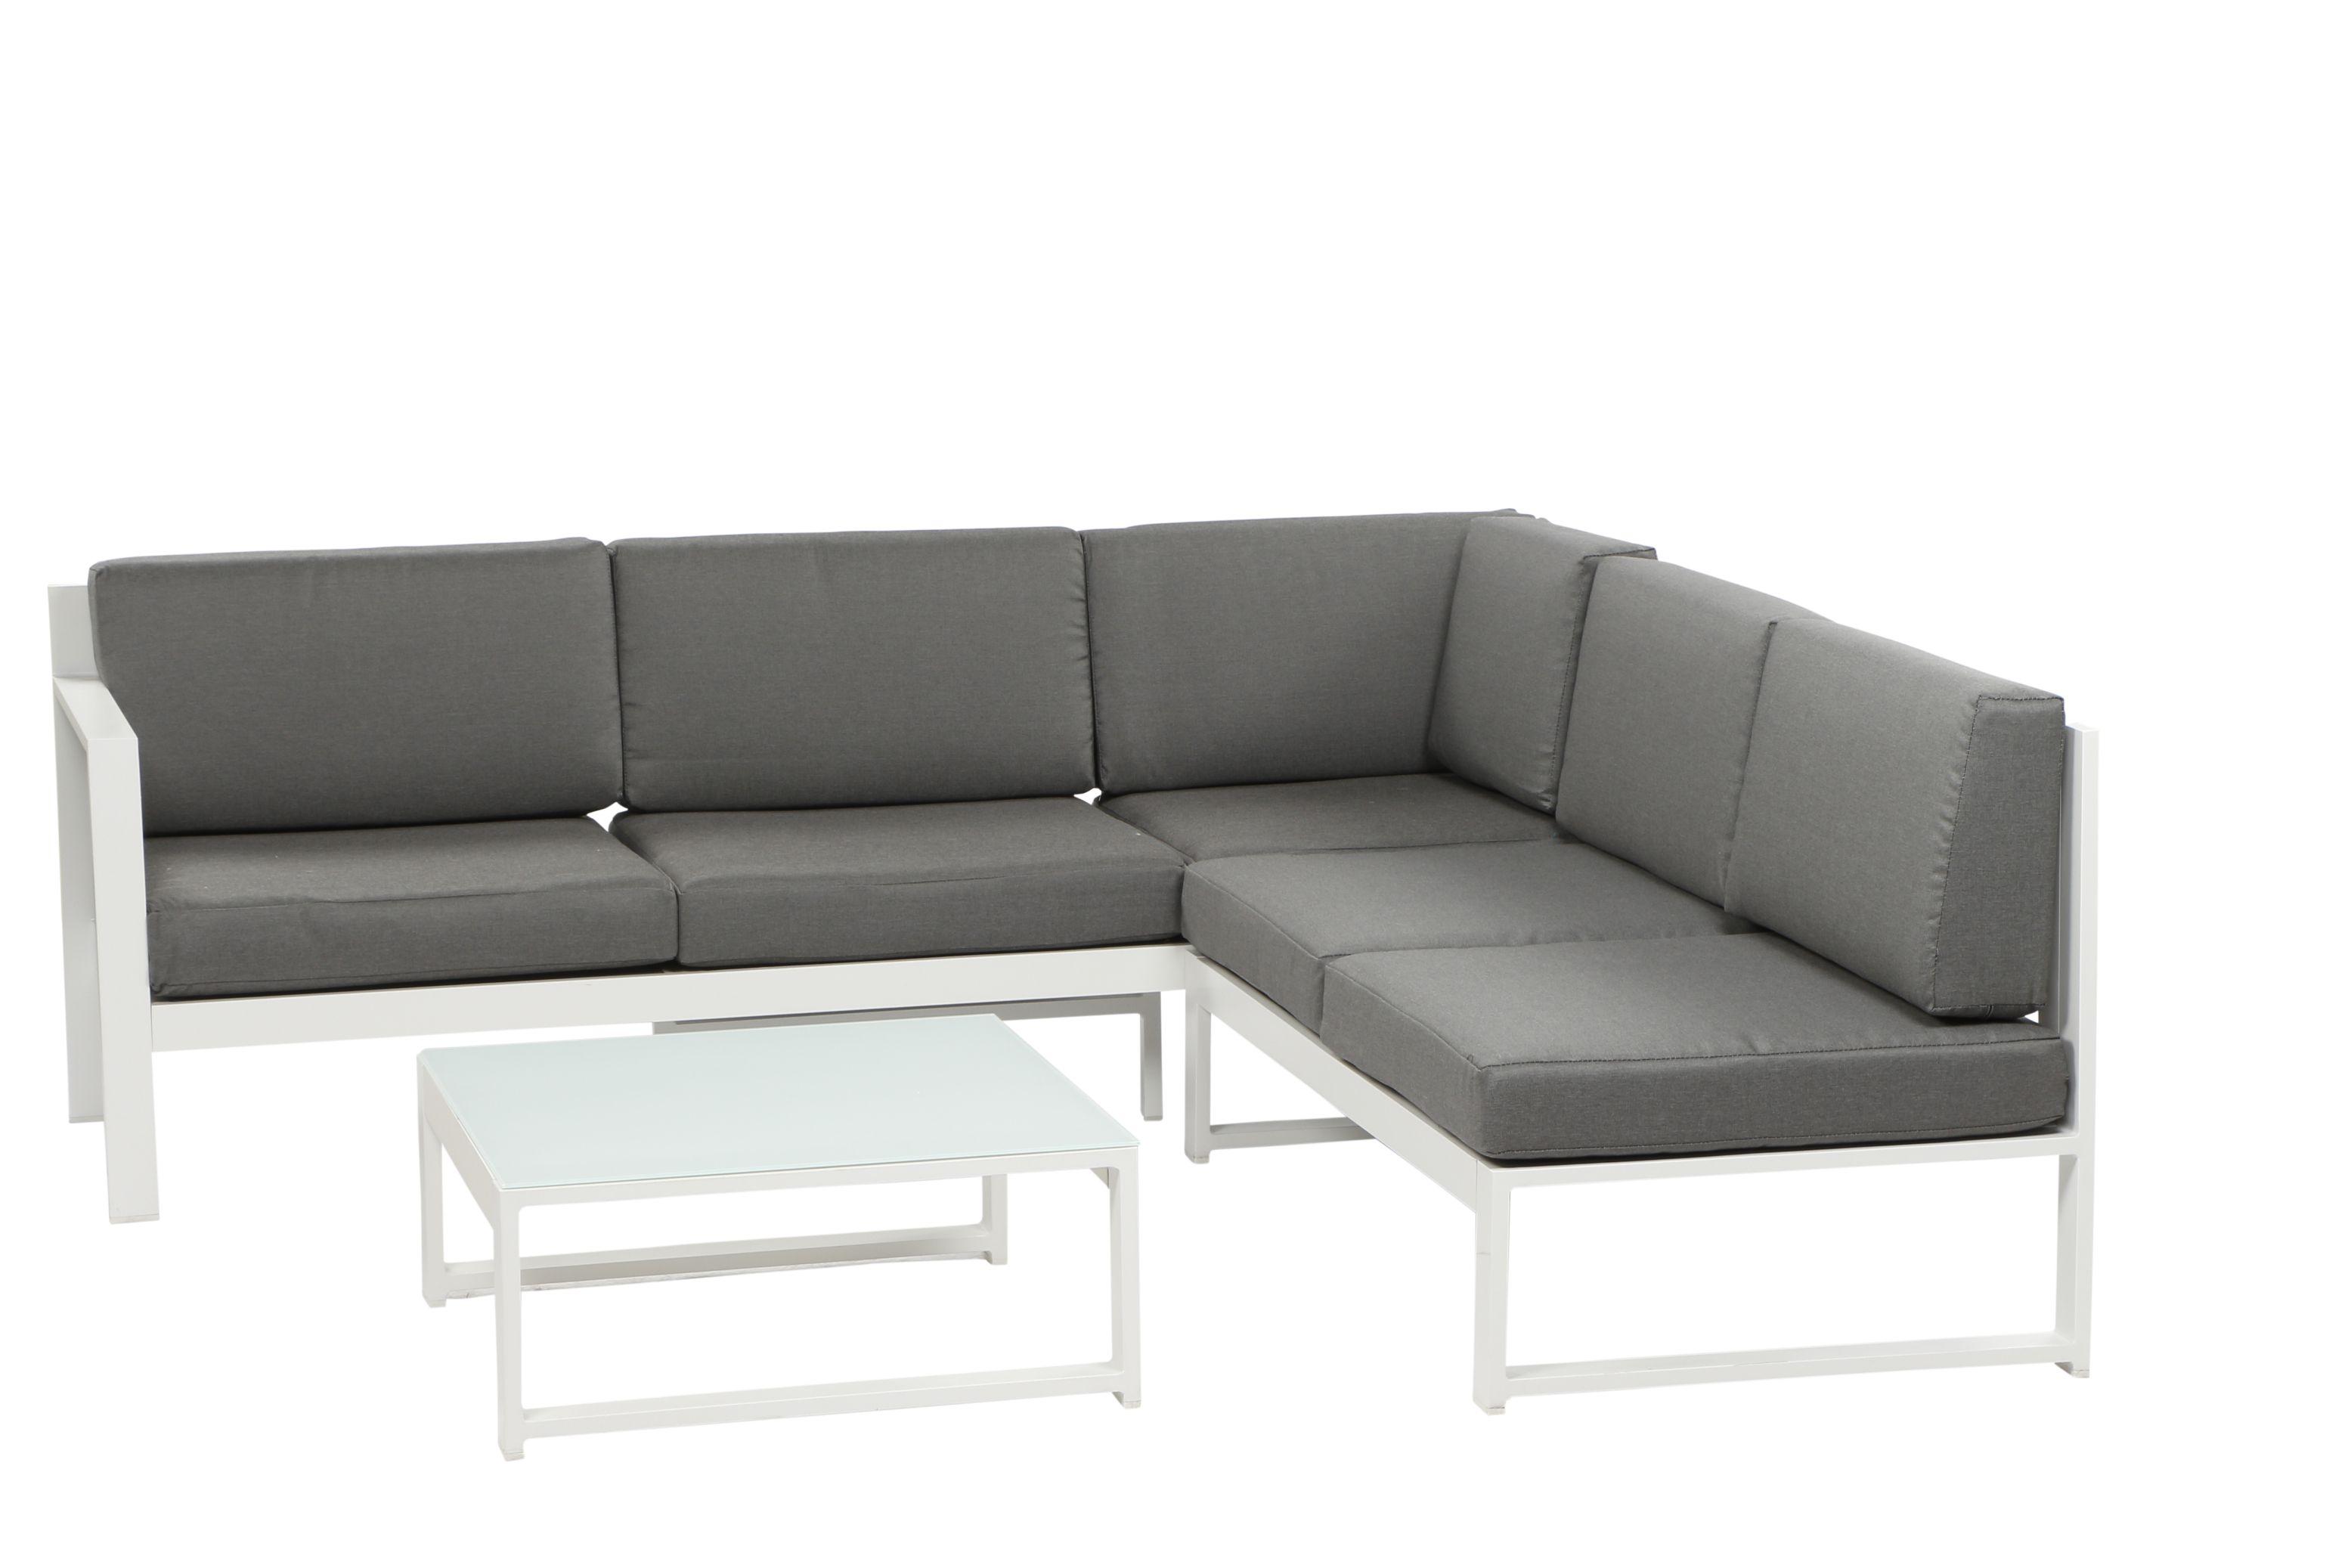 filio aluminium ecklounge gartenm bel set sitzgruppe wei. Black Bedroom Furniture Sets. Home Design Ideas